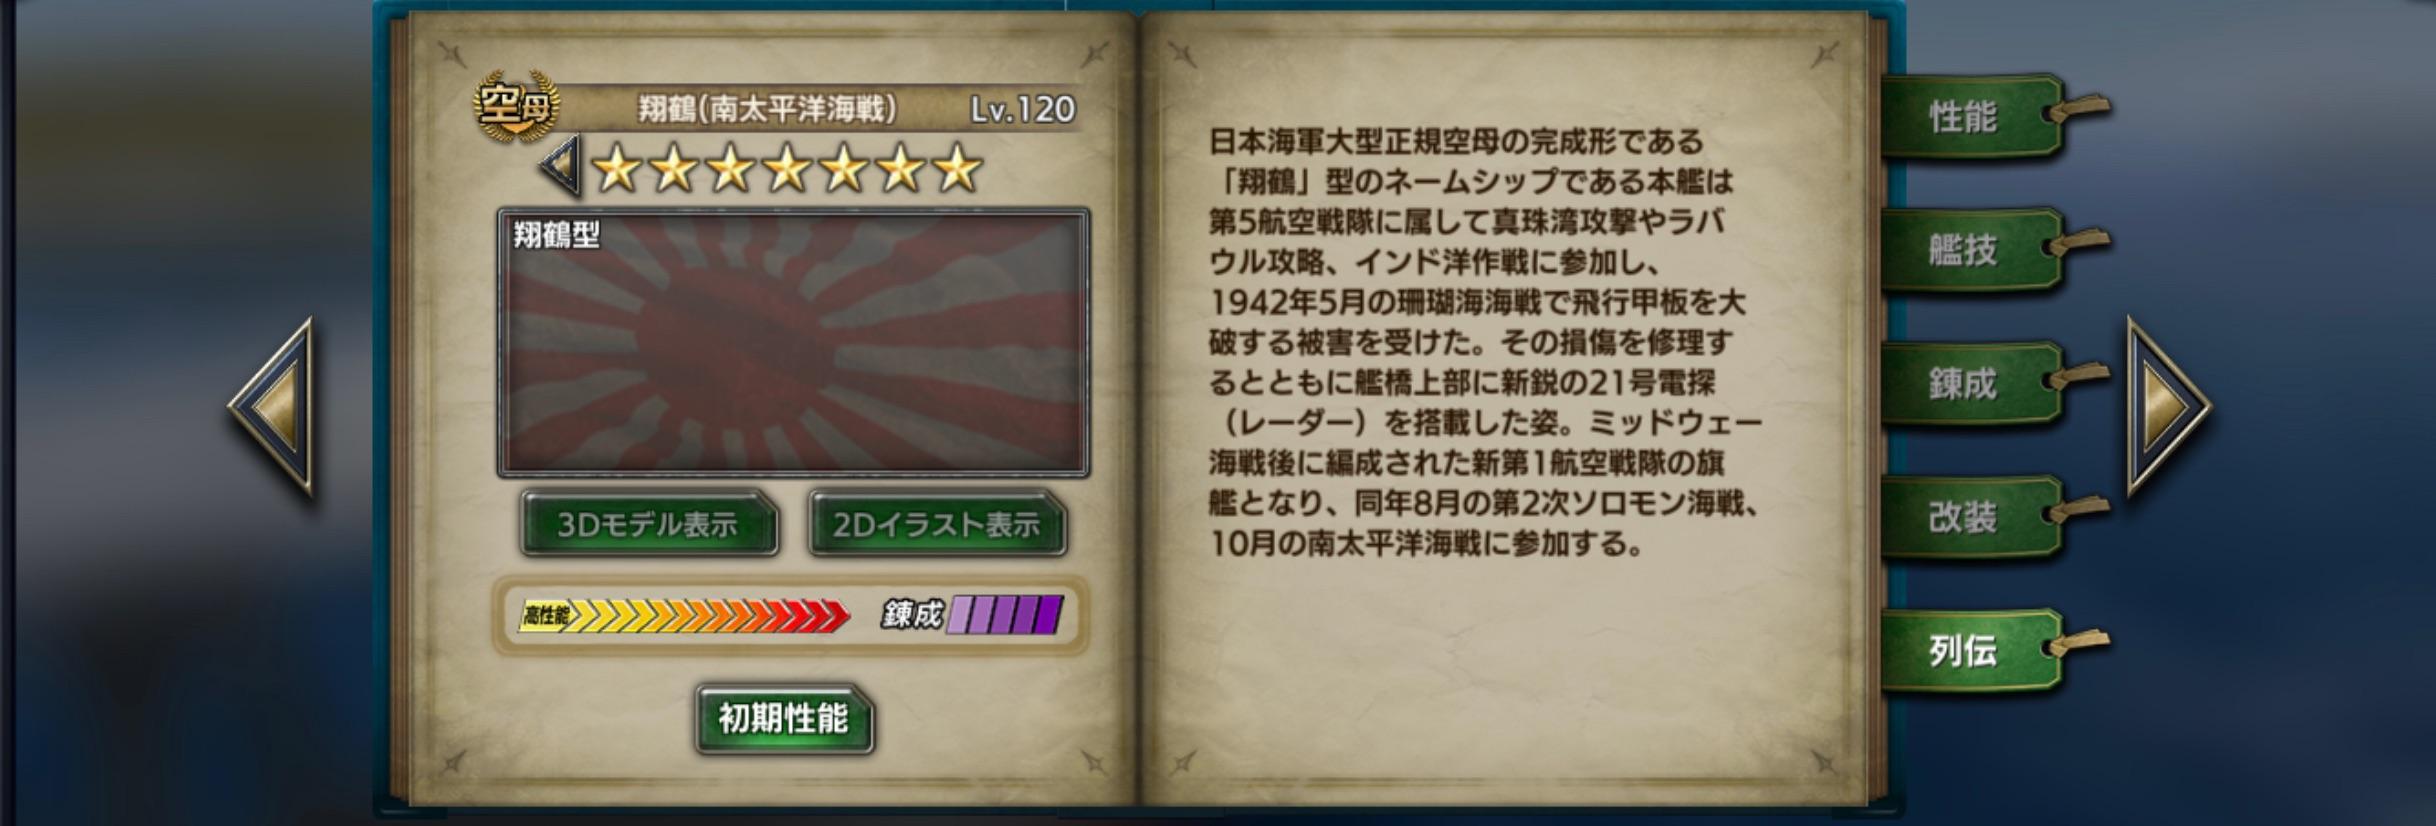 ShokakuS-history